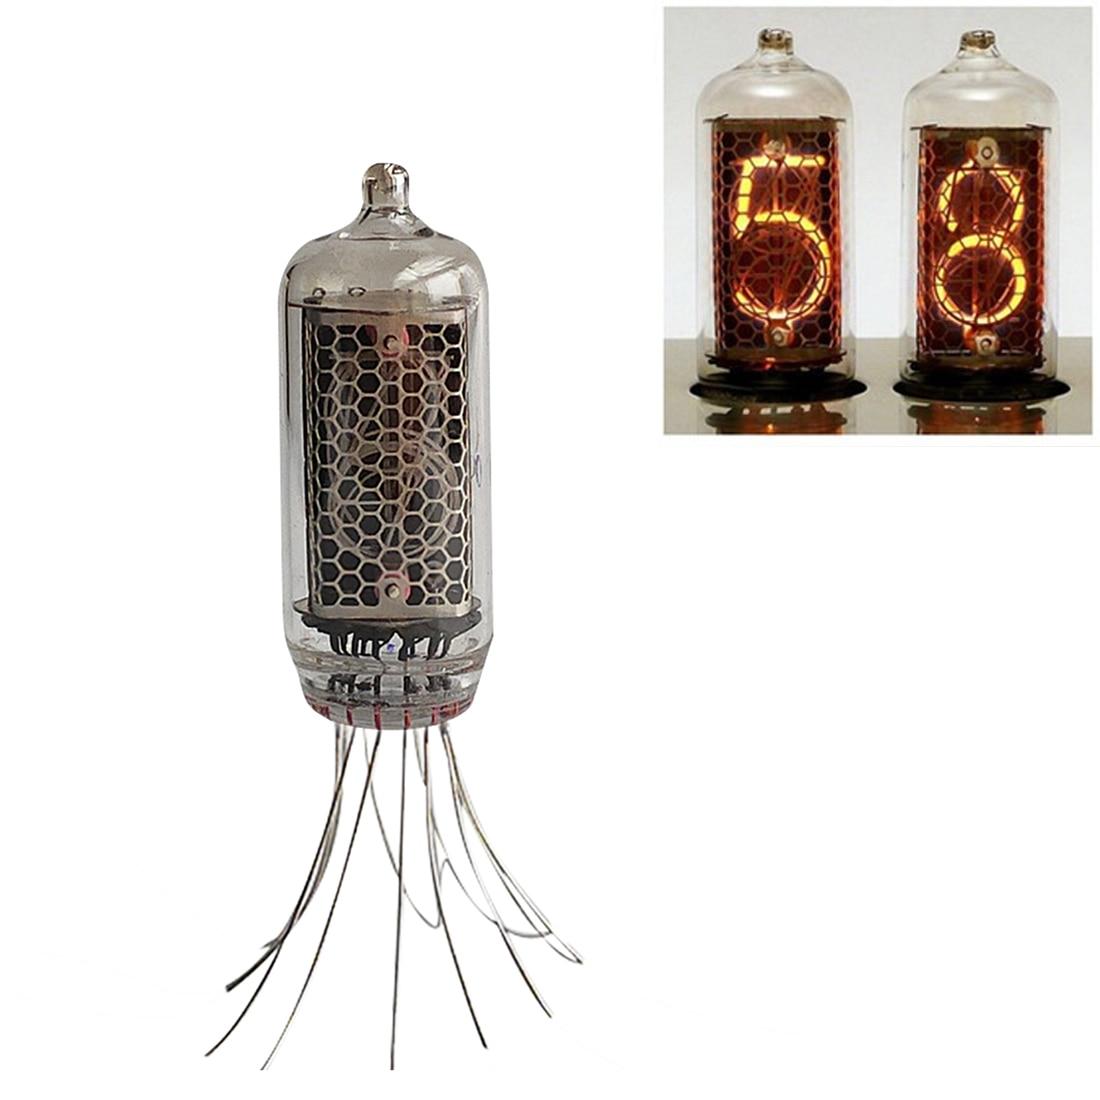 DIY Electronic Vacuum Tube IN-8-2 Glow Tube For Glow Tube Clock Base For Children Kids Developmental Early Educational Toys Gift